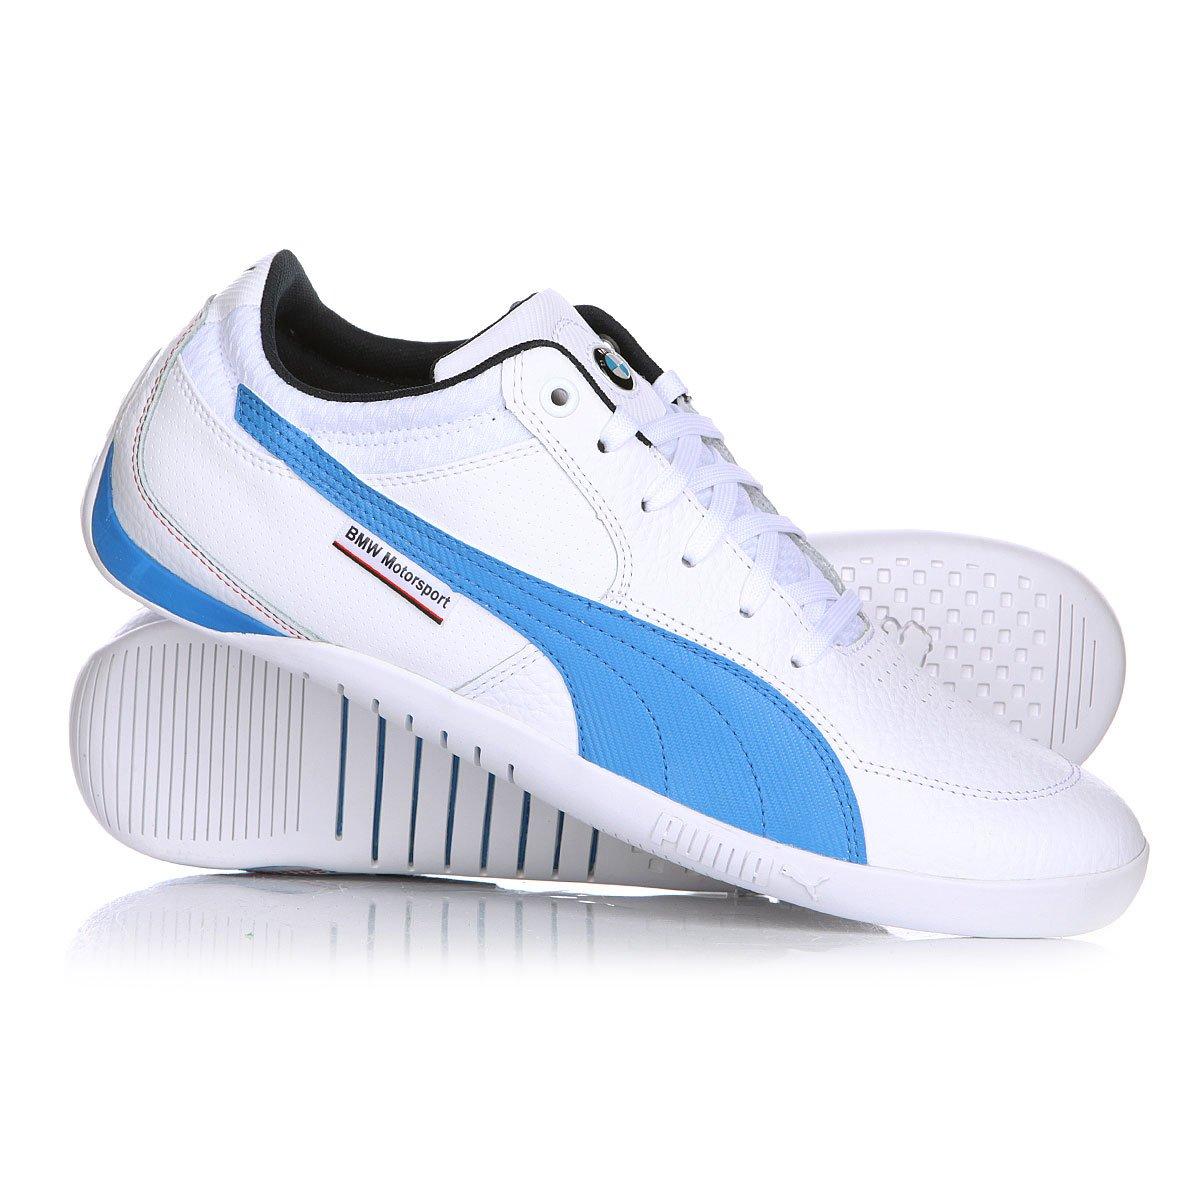 d7c10f44d474 Купить кеды Puma Bmw Ms Chrono Delta Lo White French Blue в интернет ...